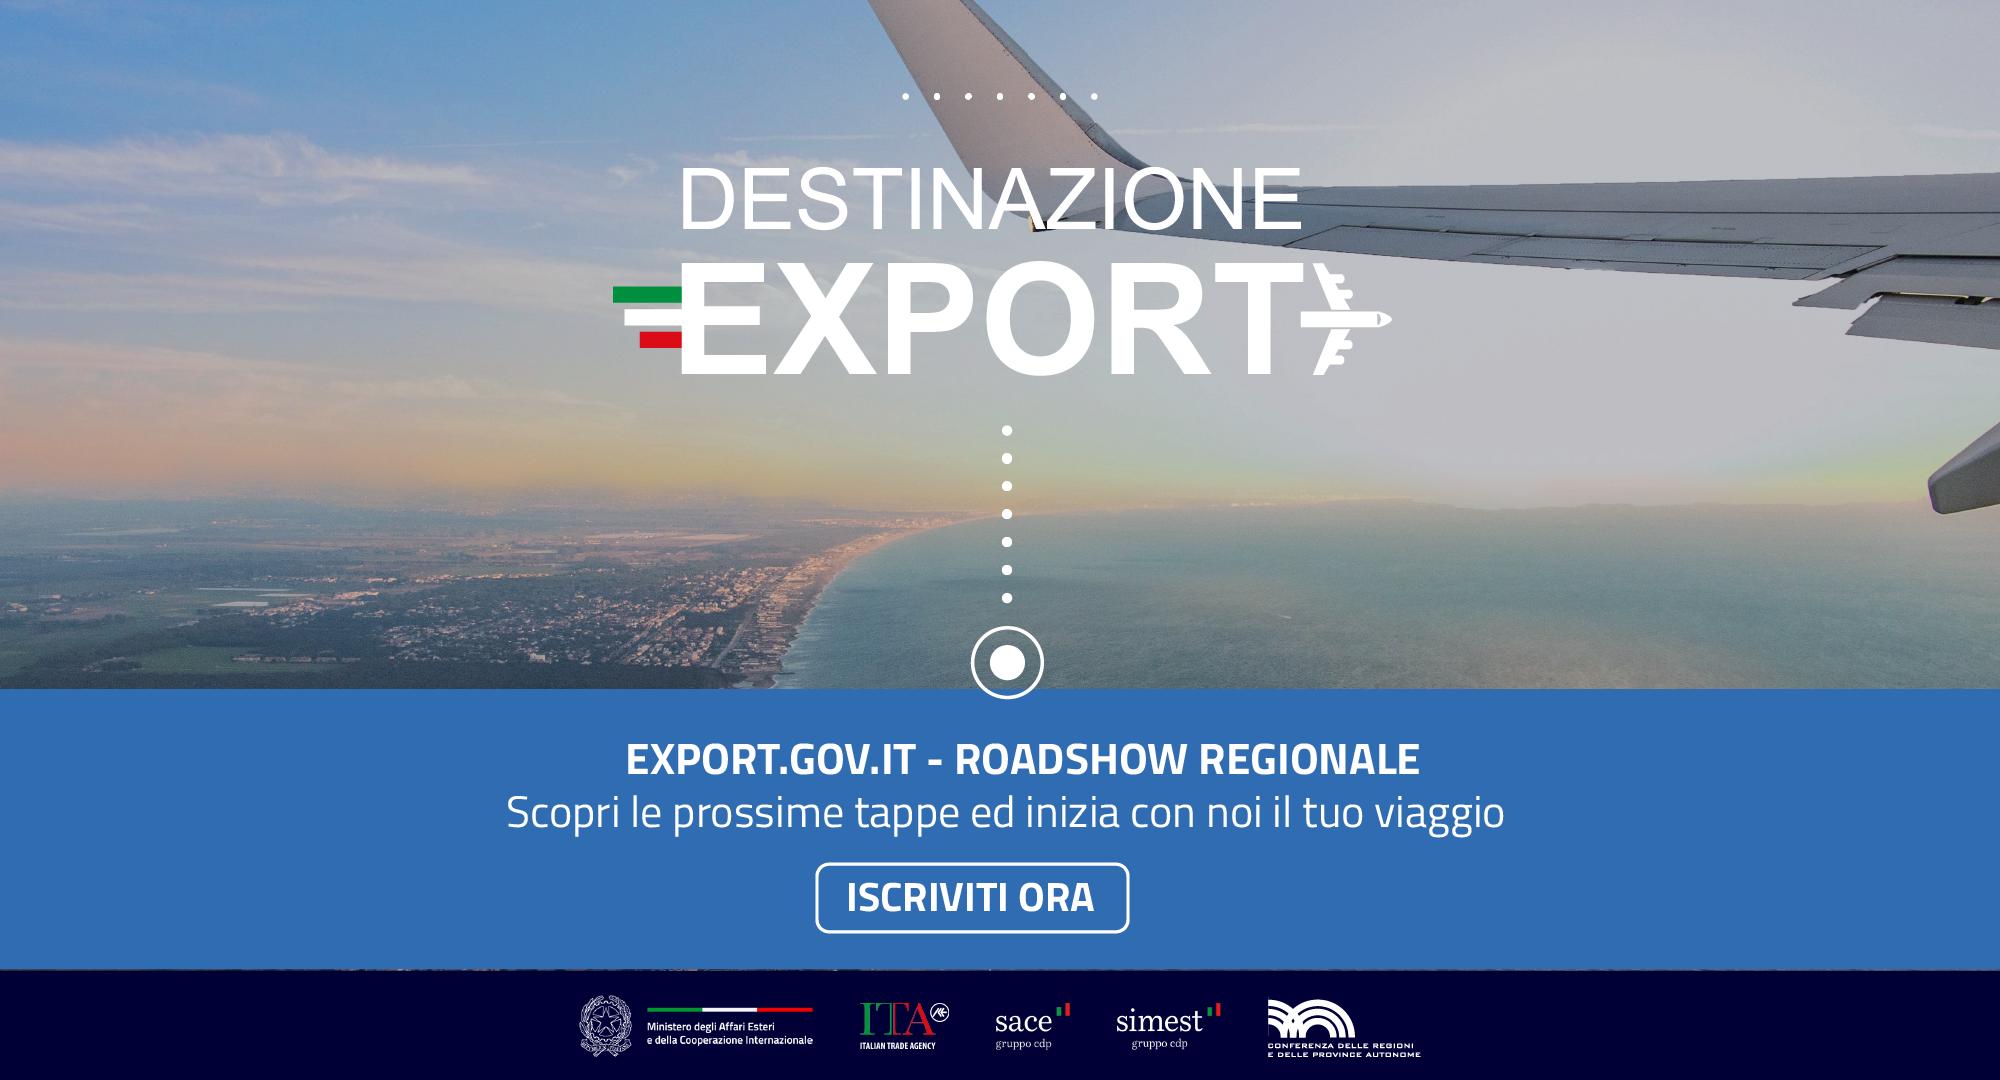 file/ELEMENTO_NEWSLETTER/23183/destinazione-export.png